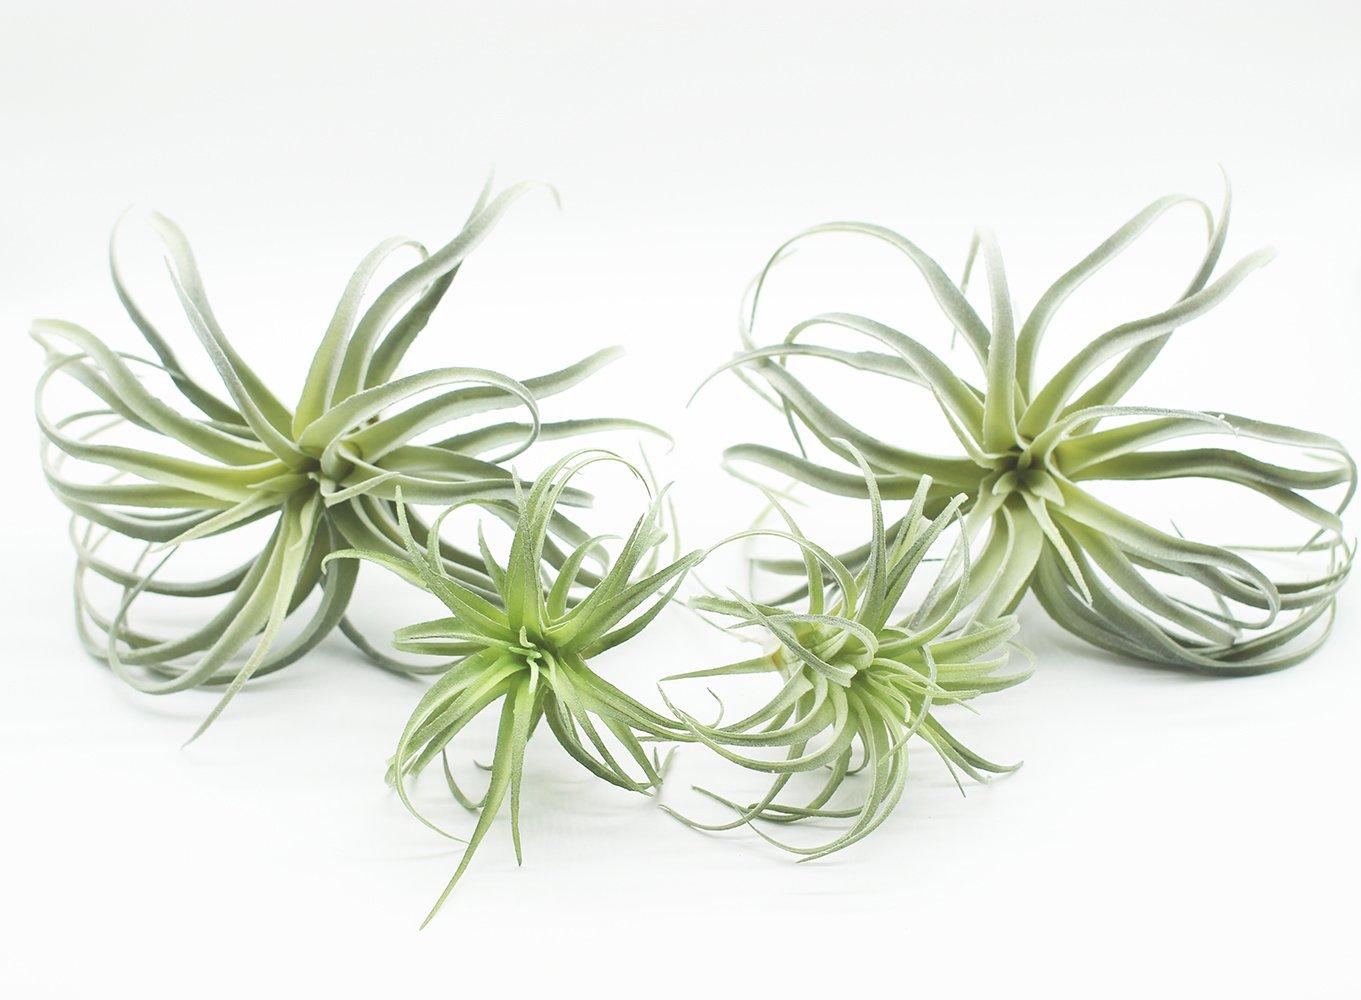 Yokoke人工パイナップルGrass空気植物フェイク花フェイク多肉植物Flocking Tillandsia Bromeliadsホームガーデン装飾4個11 cm Assortment B07BK4YSNY